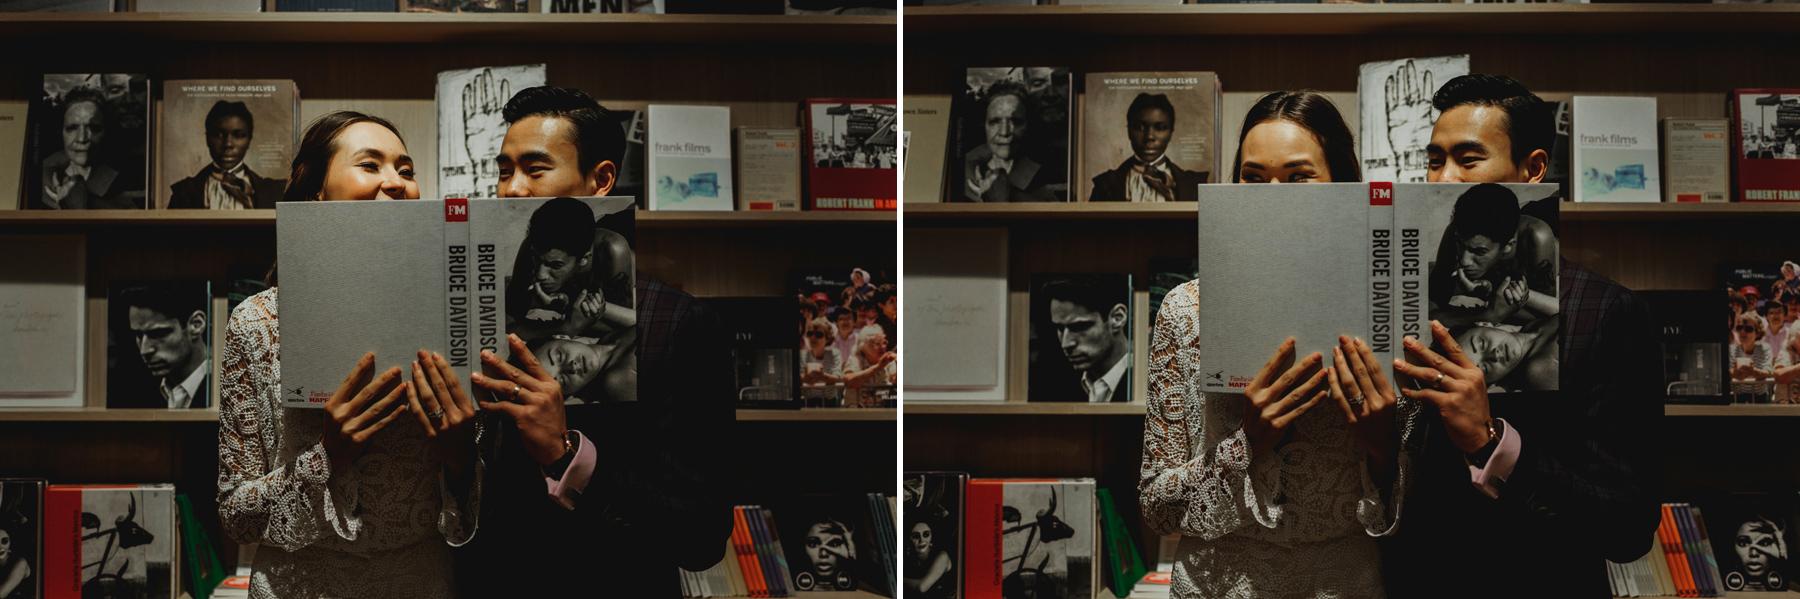 Polygon Gallery Bookstore